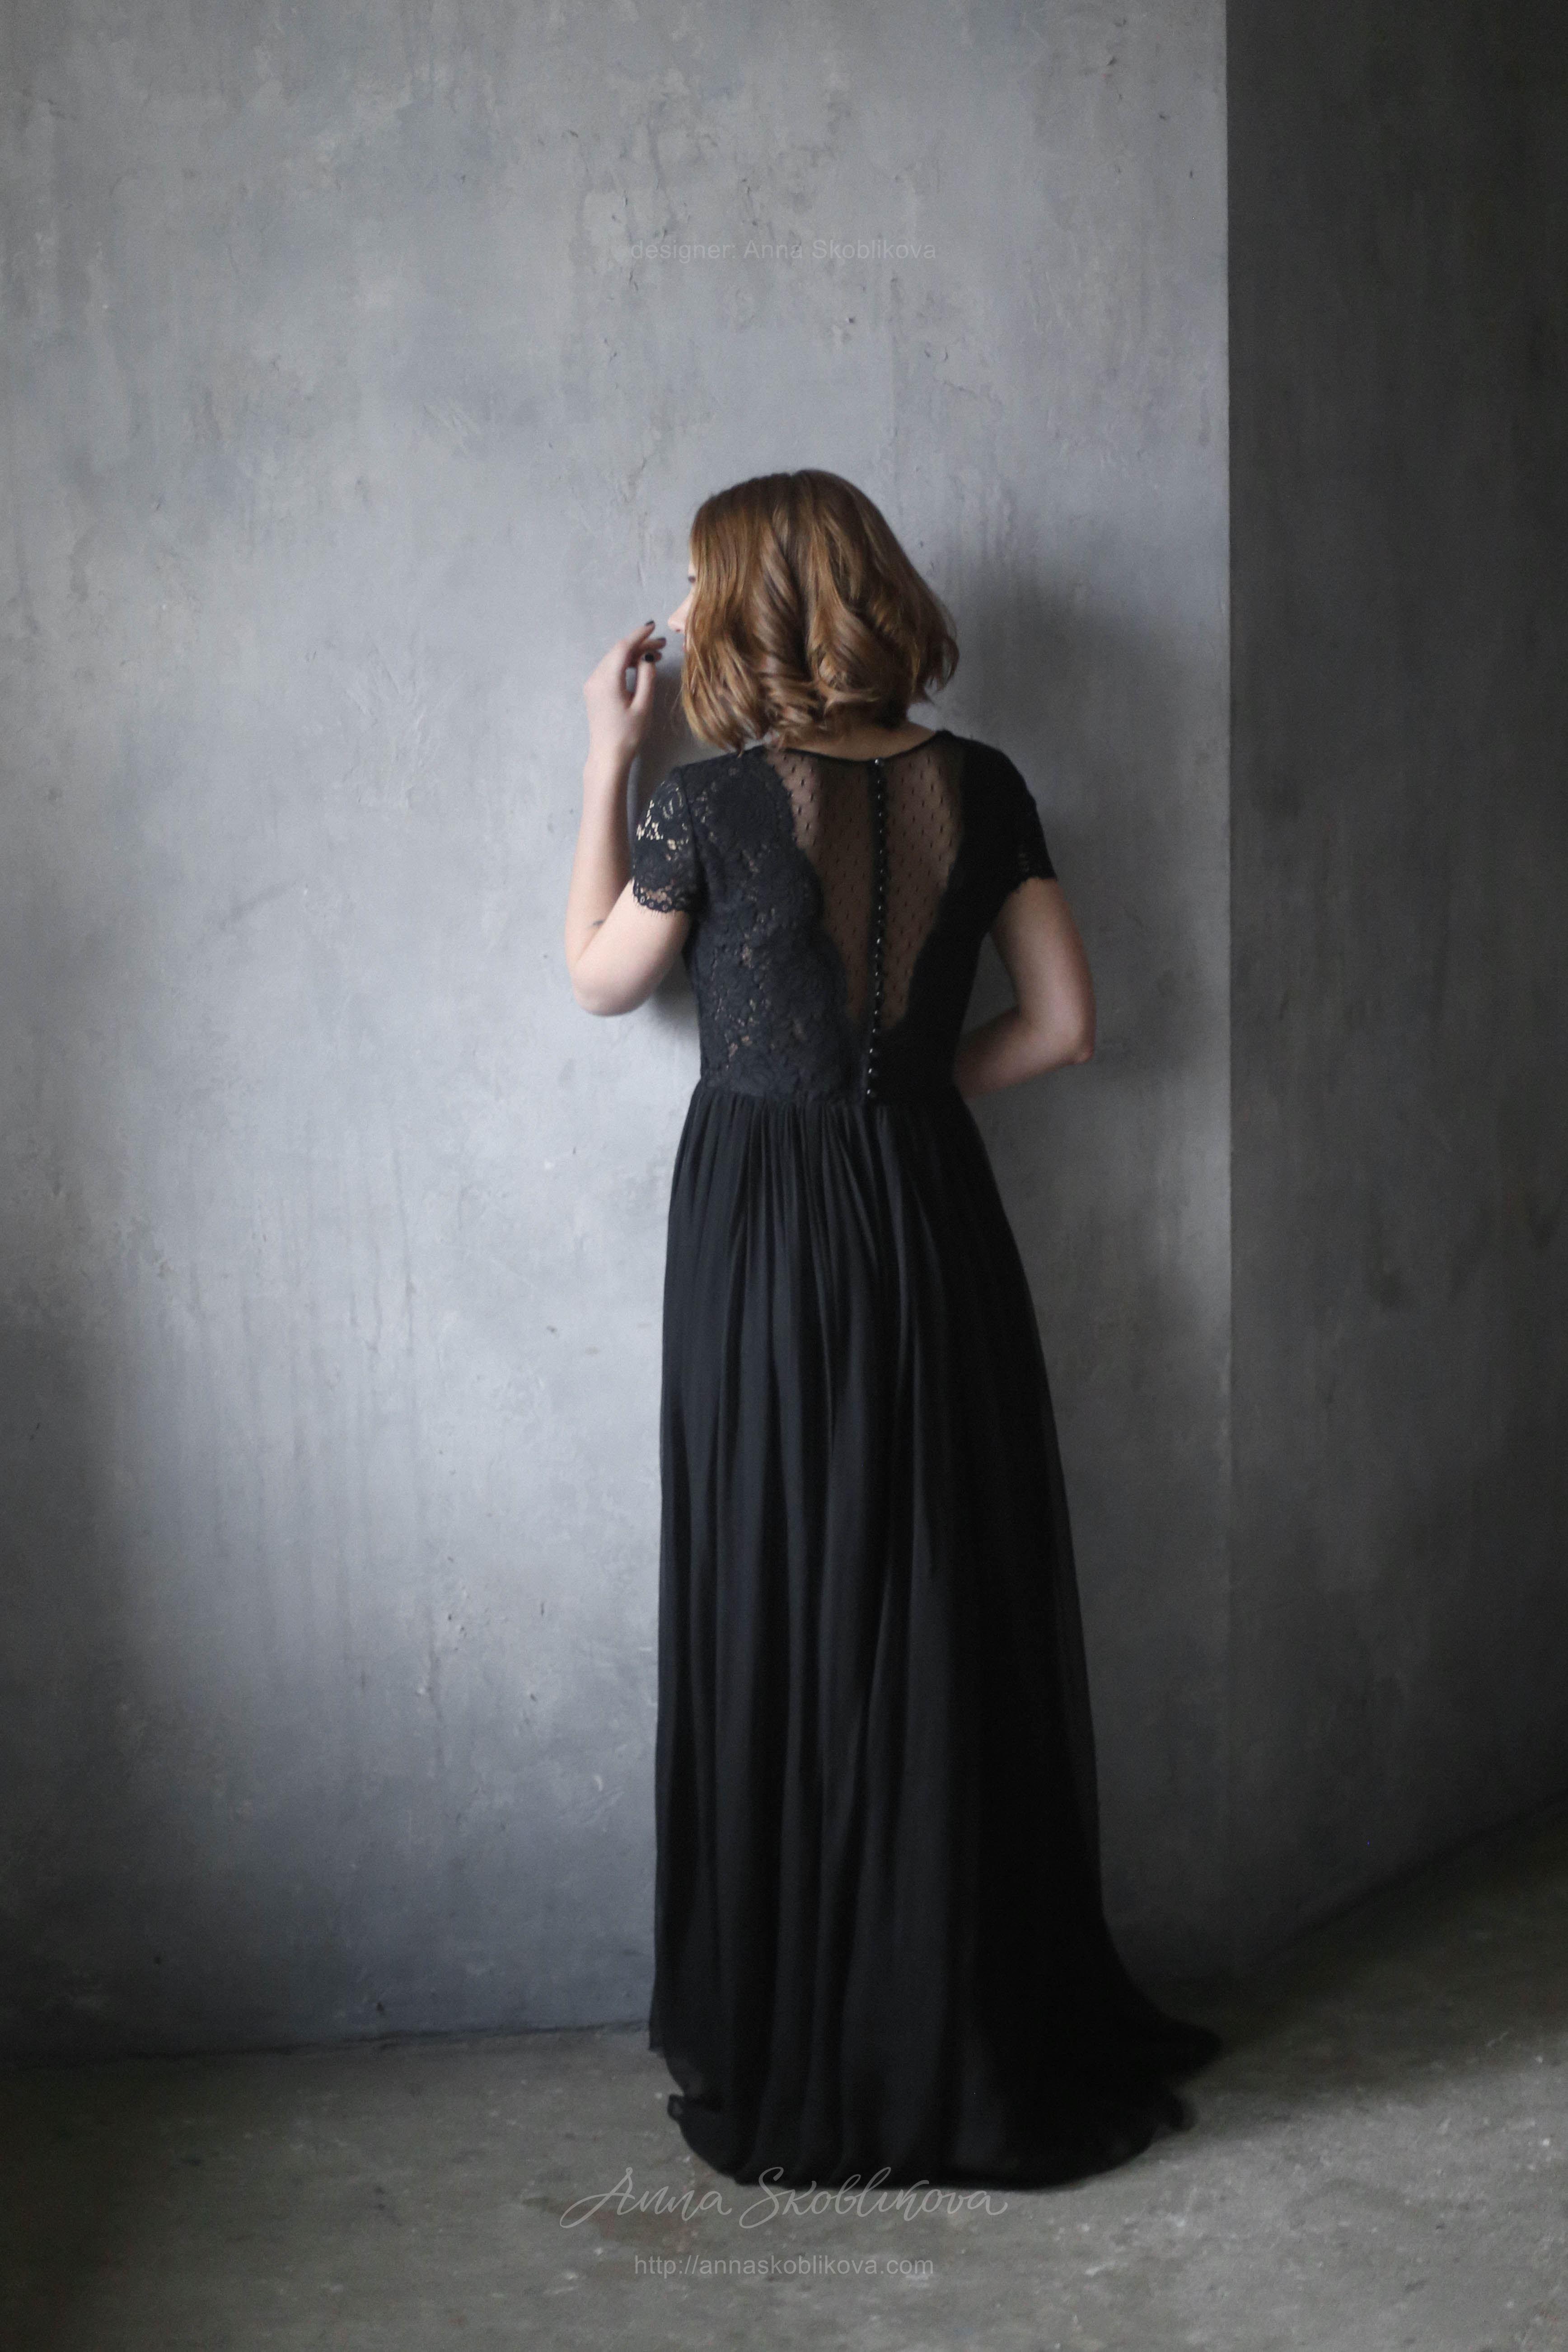 Black evening - Wedding dress | Anna Skoblikova - Wedding Dresses ...